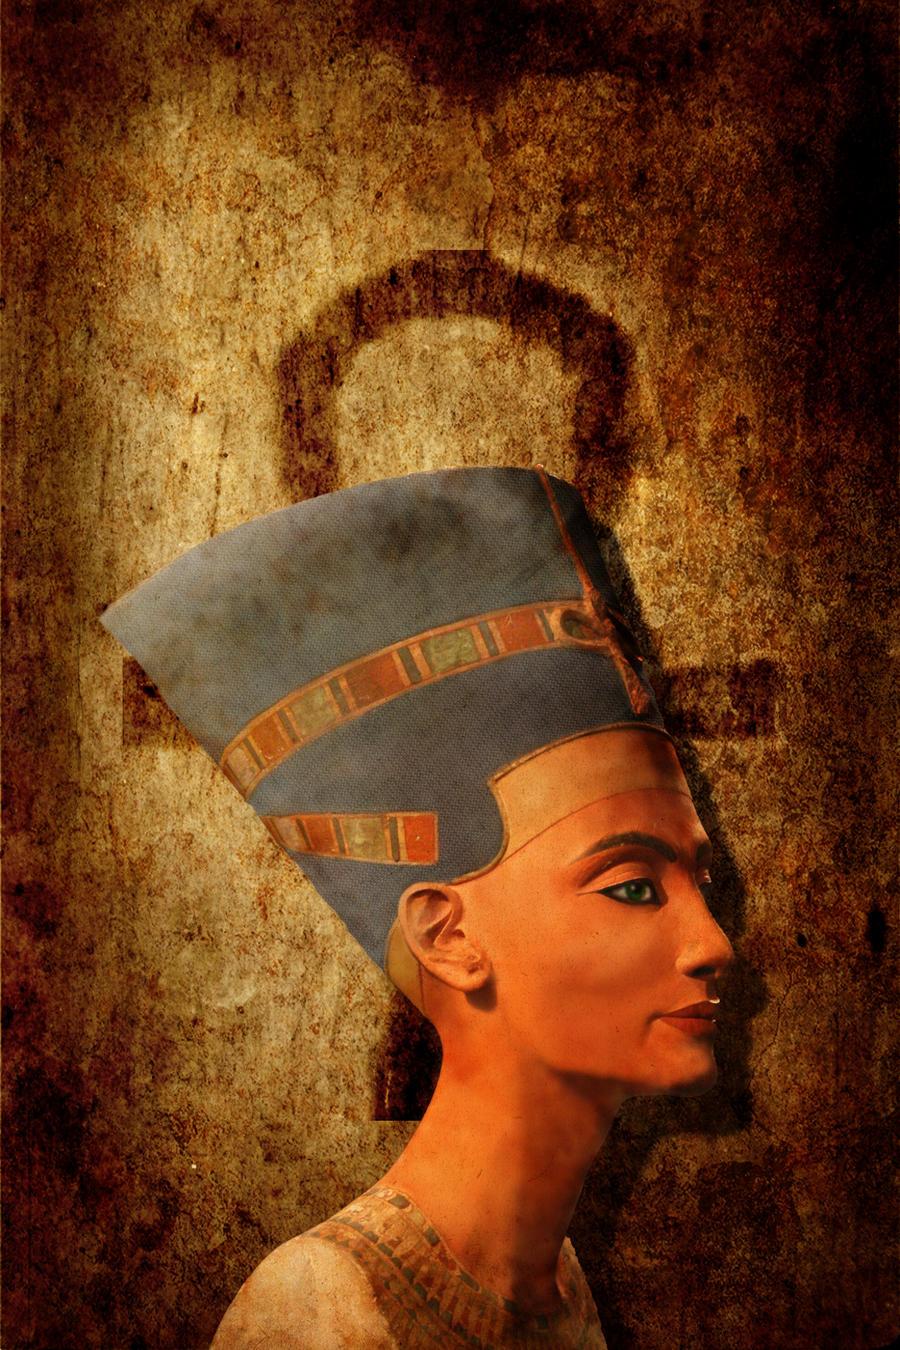 http://fc04.deviantart.net/fs27/i/2008/148/3/f/Nefertiti_by_allison712.jpg